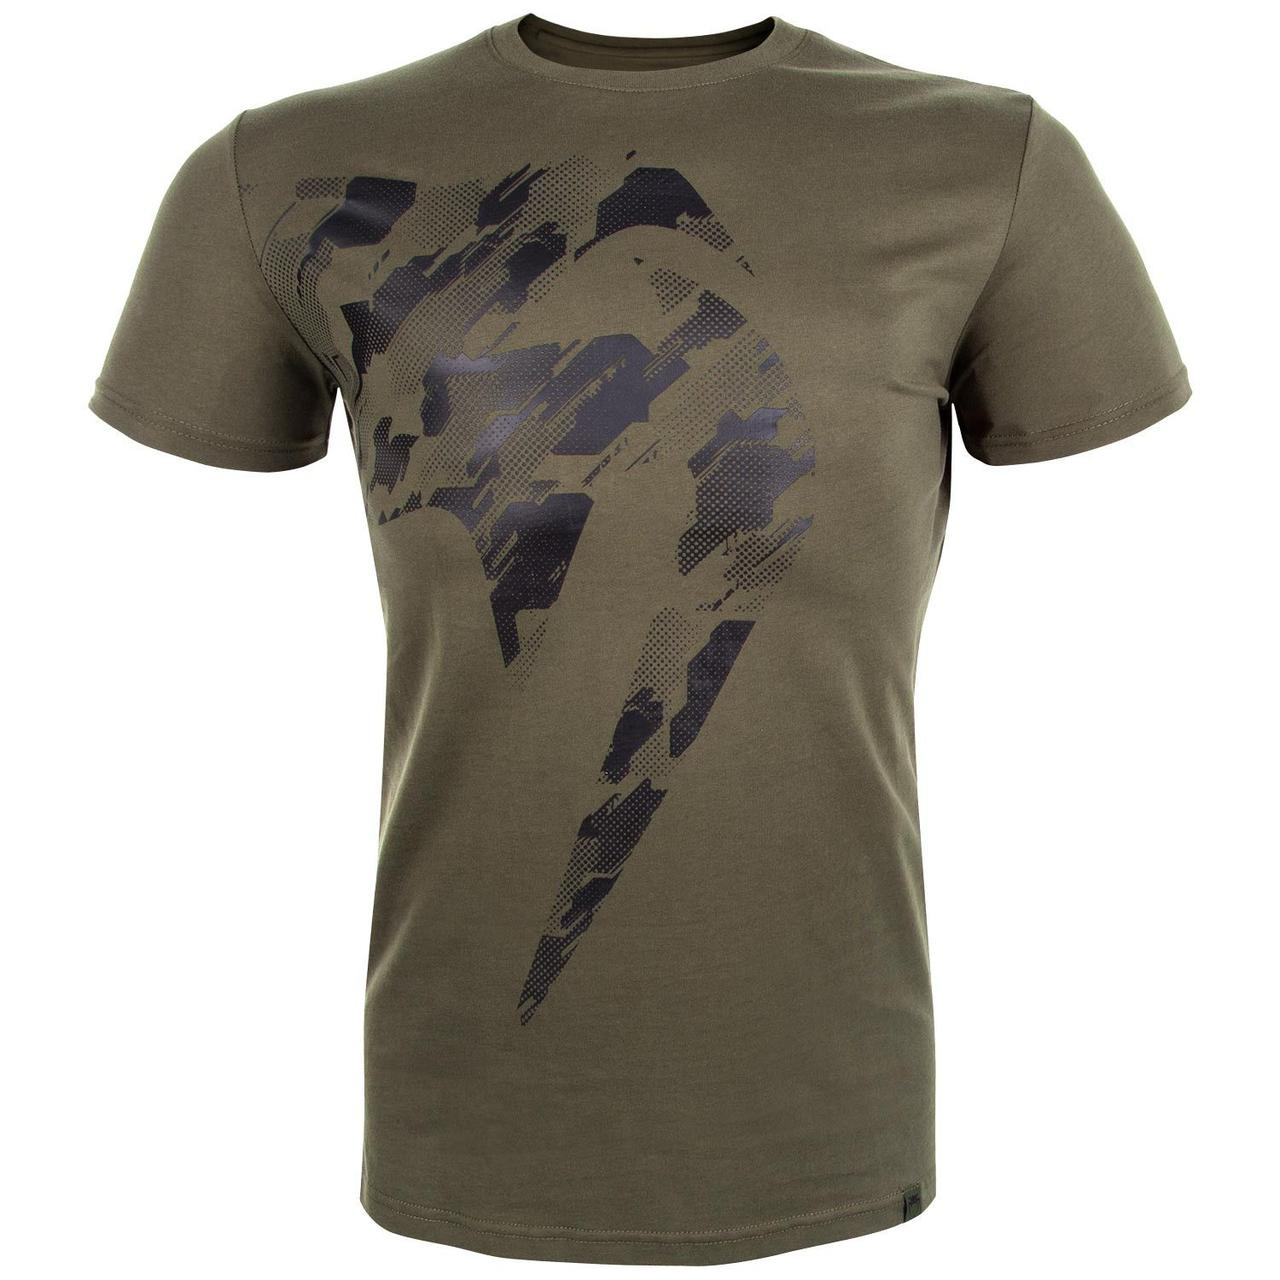 Футболка Venum Tecmo Giant T-Shirt Khaki